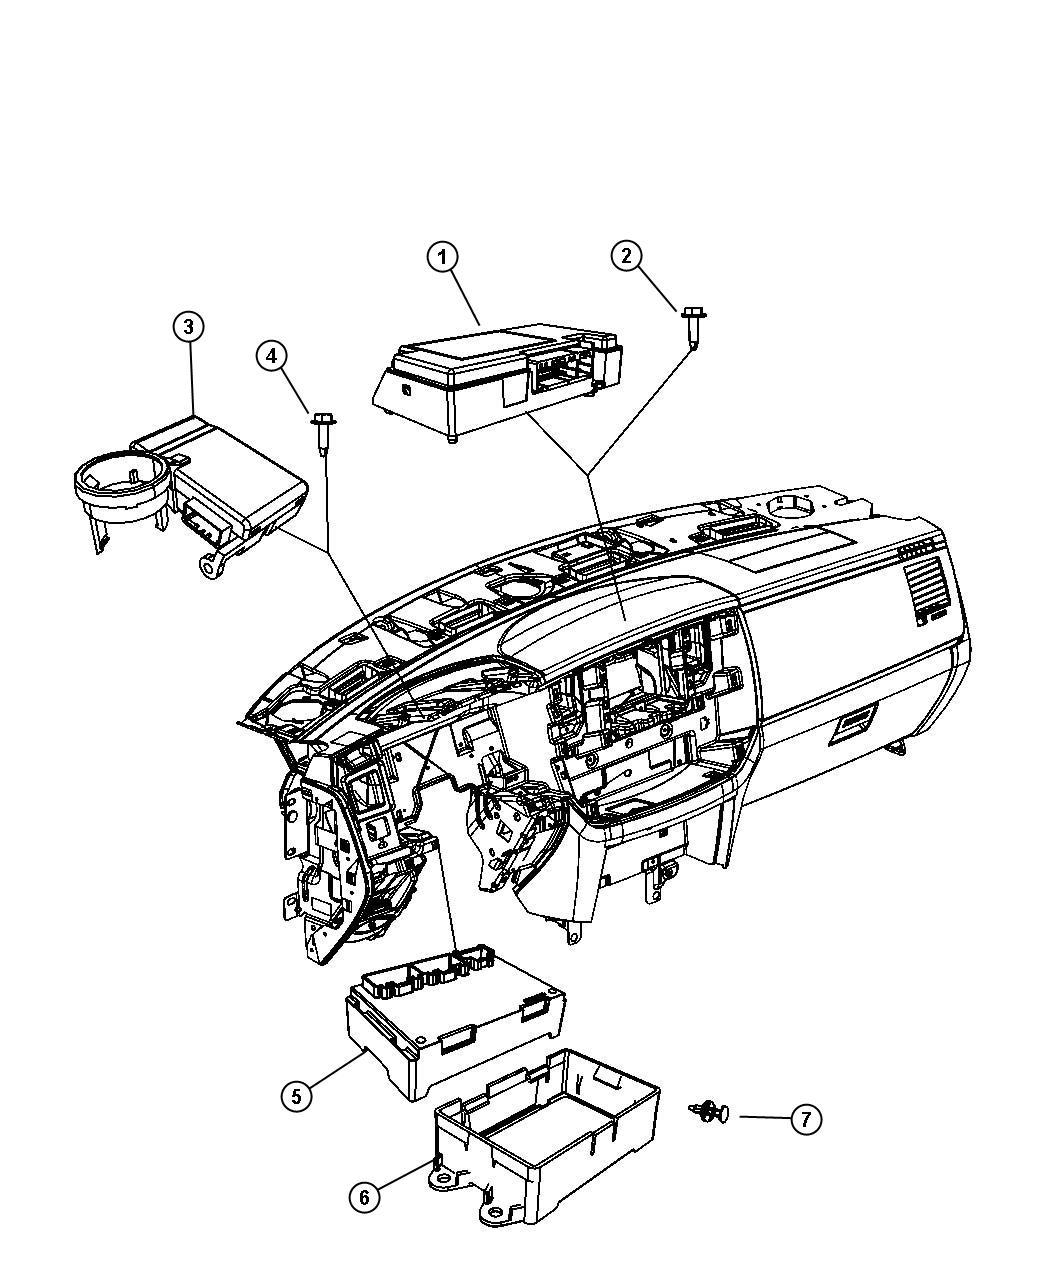 dodge durango module  transfer case control   single speed on demand transfer case